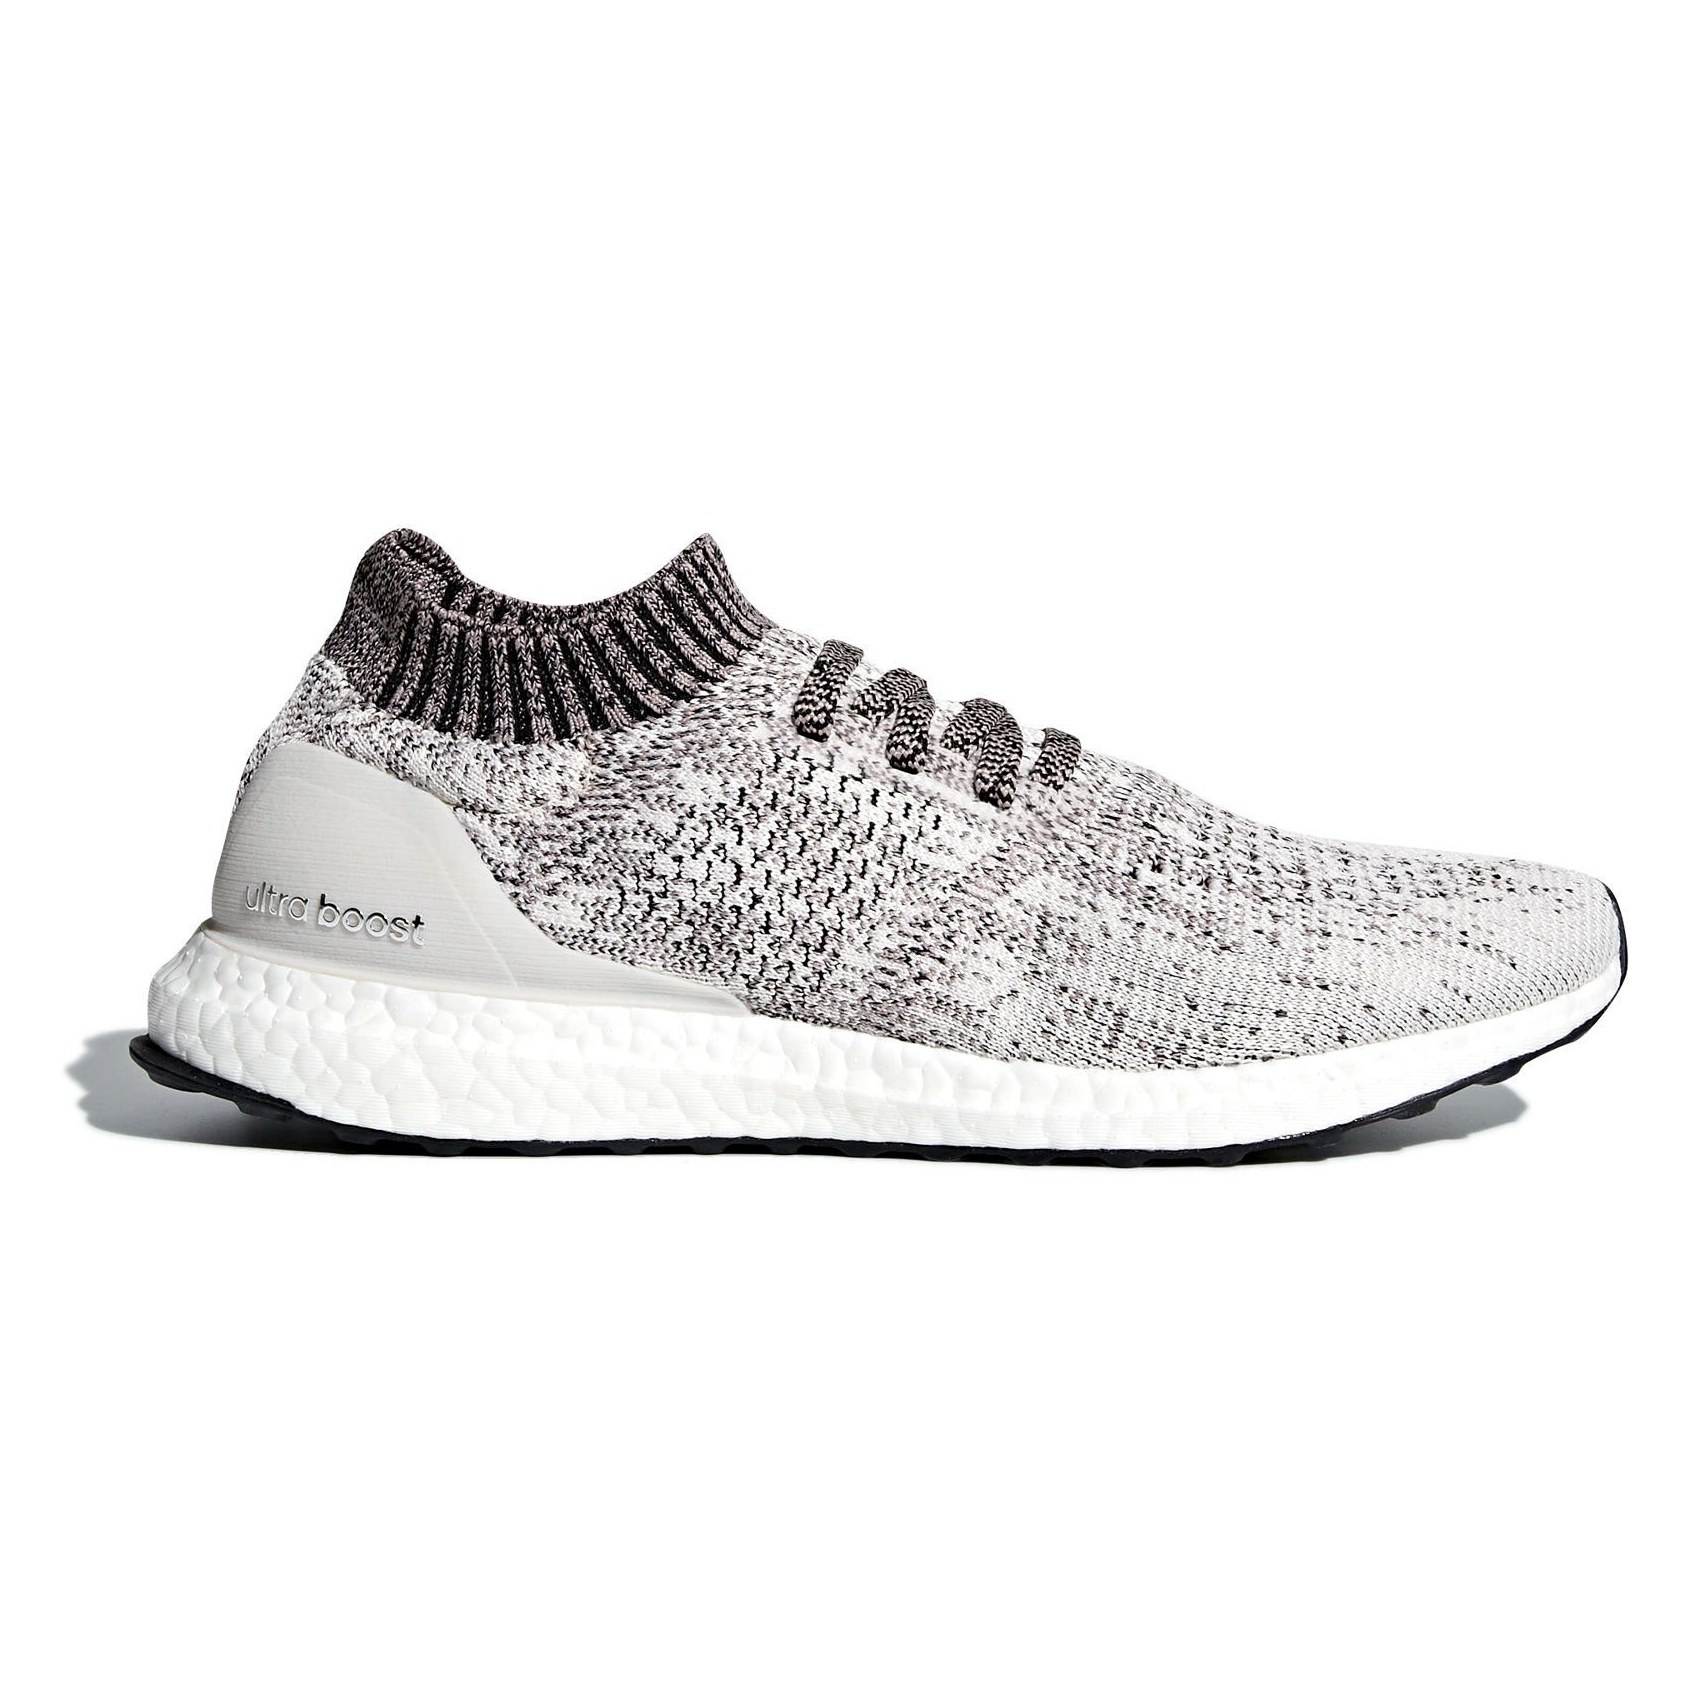 فروش کفش مخصوص دویدن مردانه آدیداس مدل Ultraboost